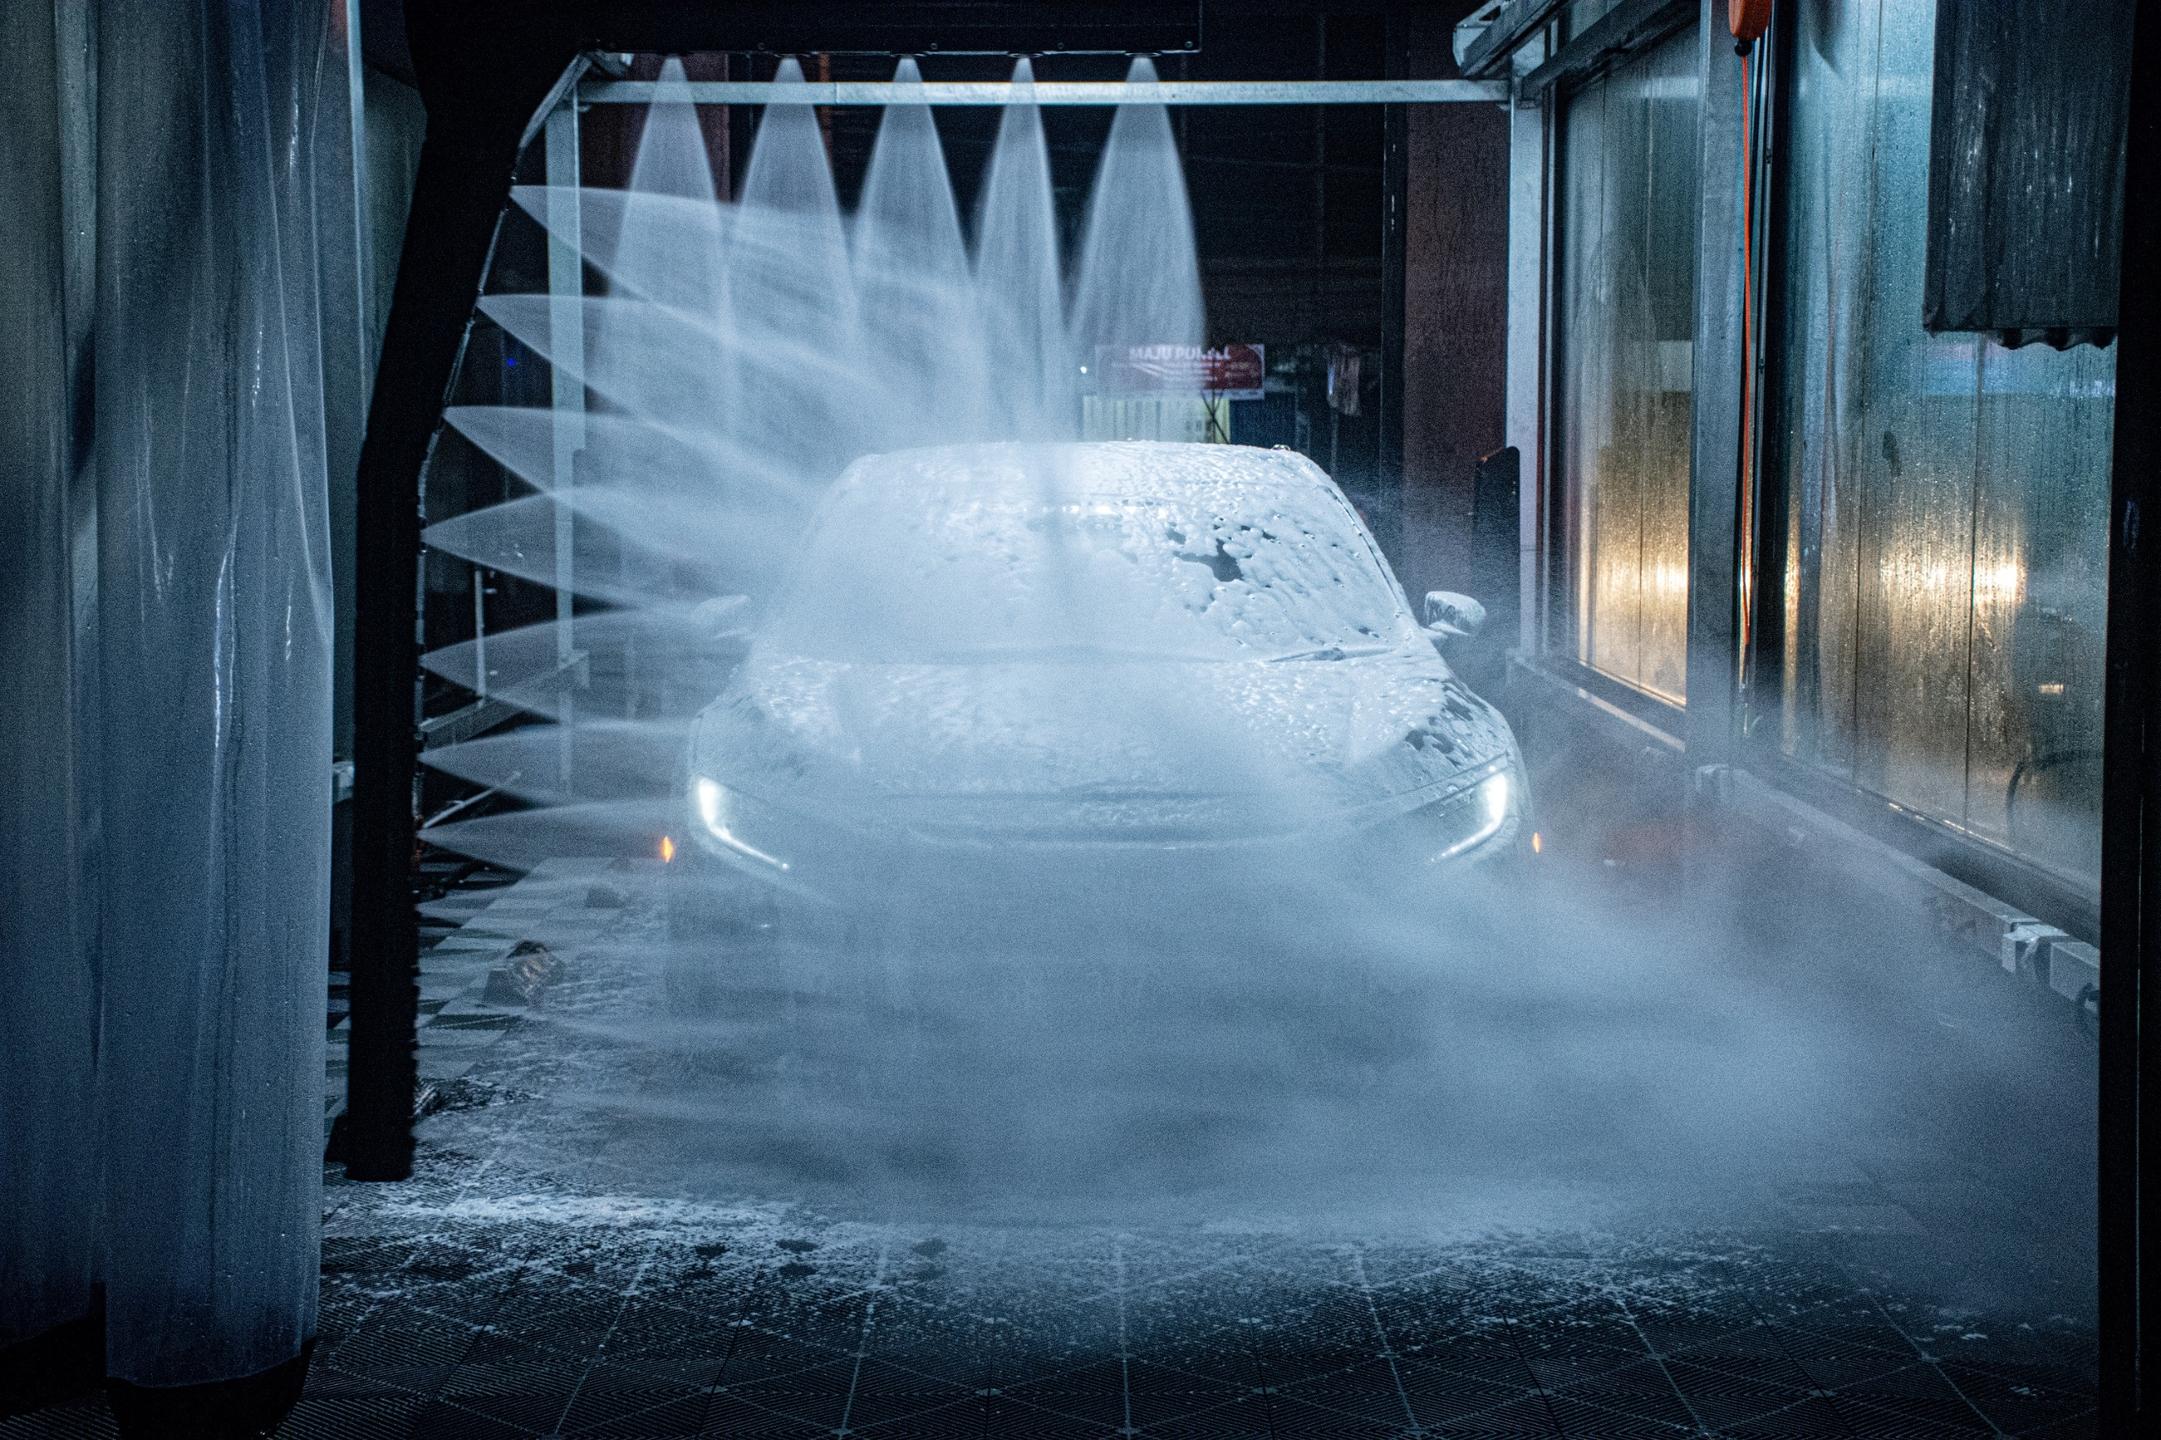 Top Gear Car Wash (@topcar_wash) Cover Image